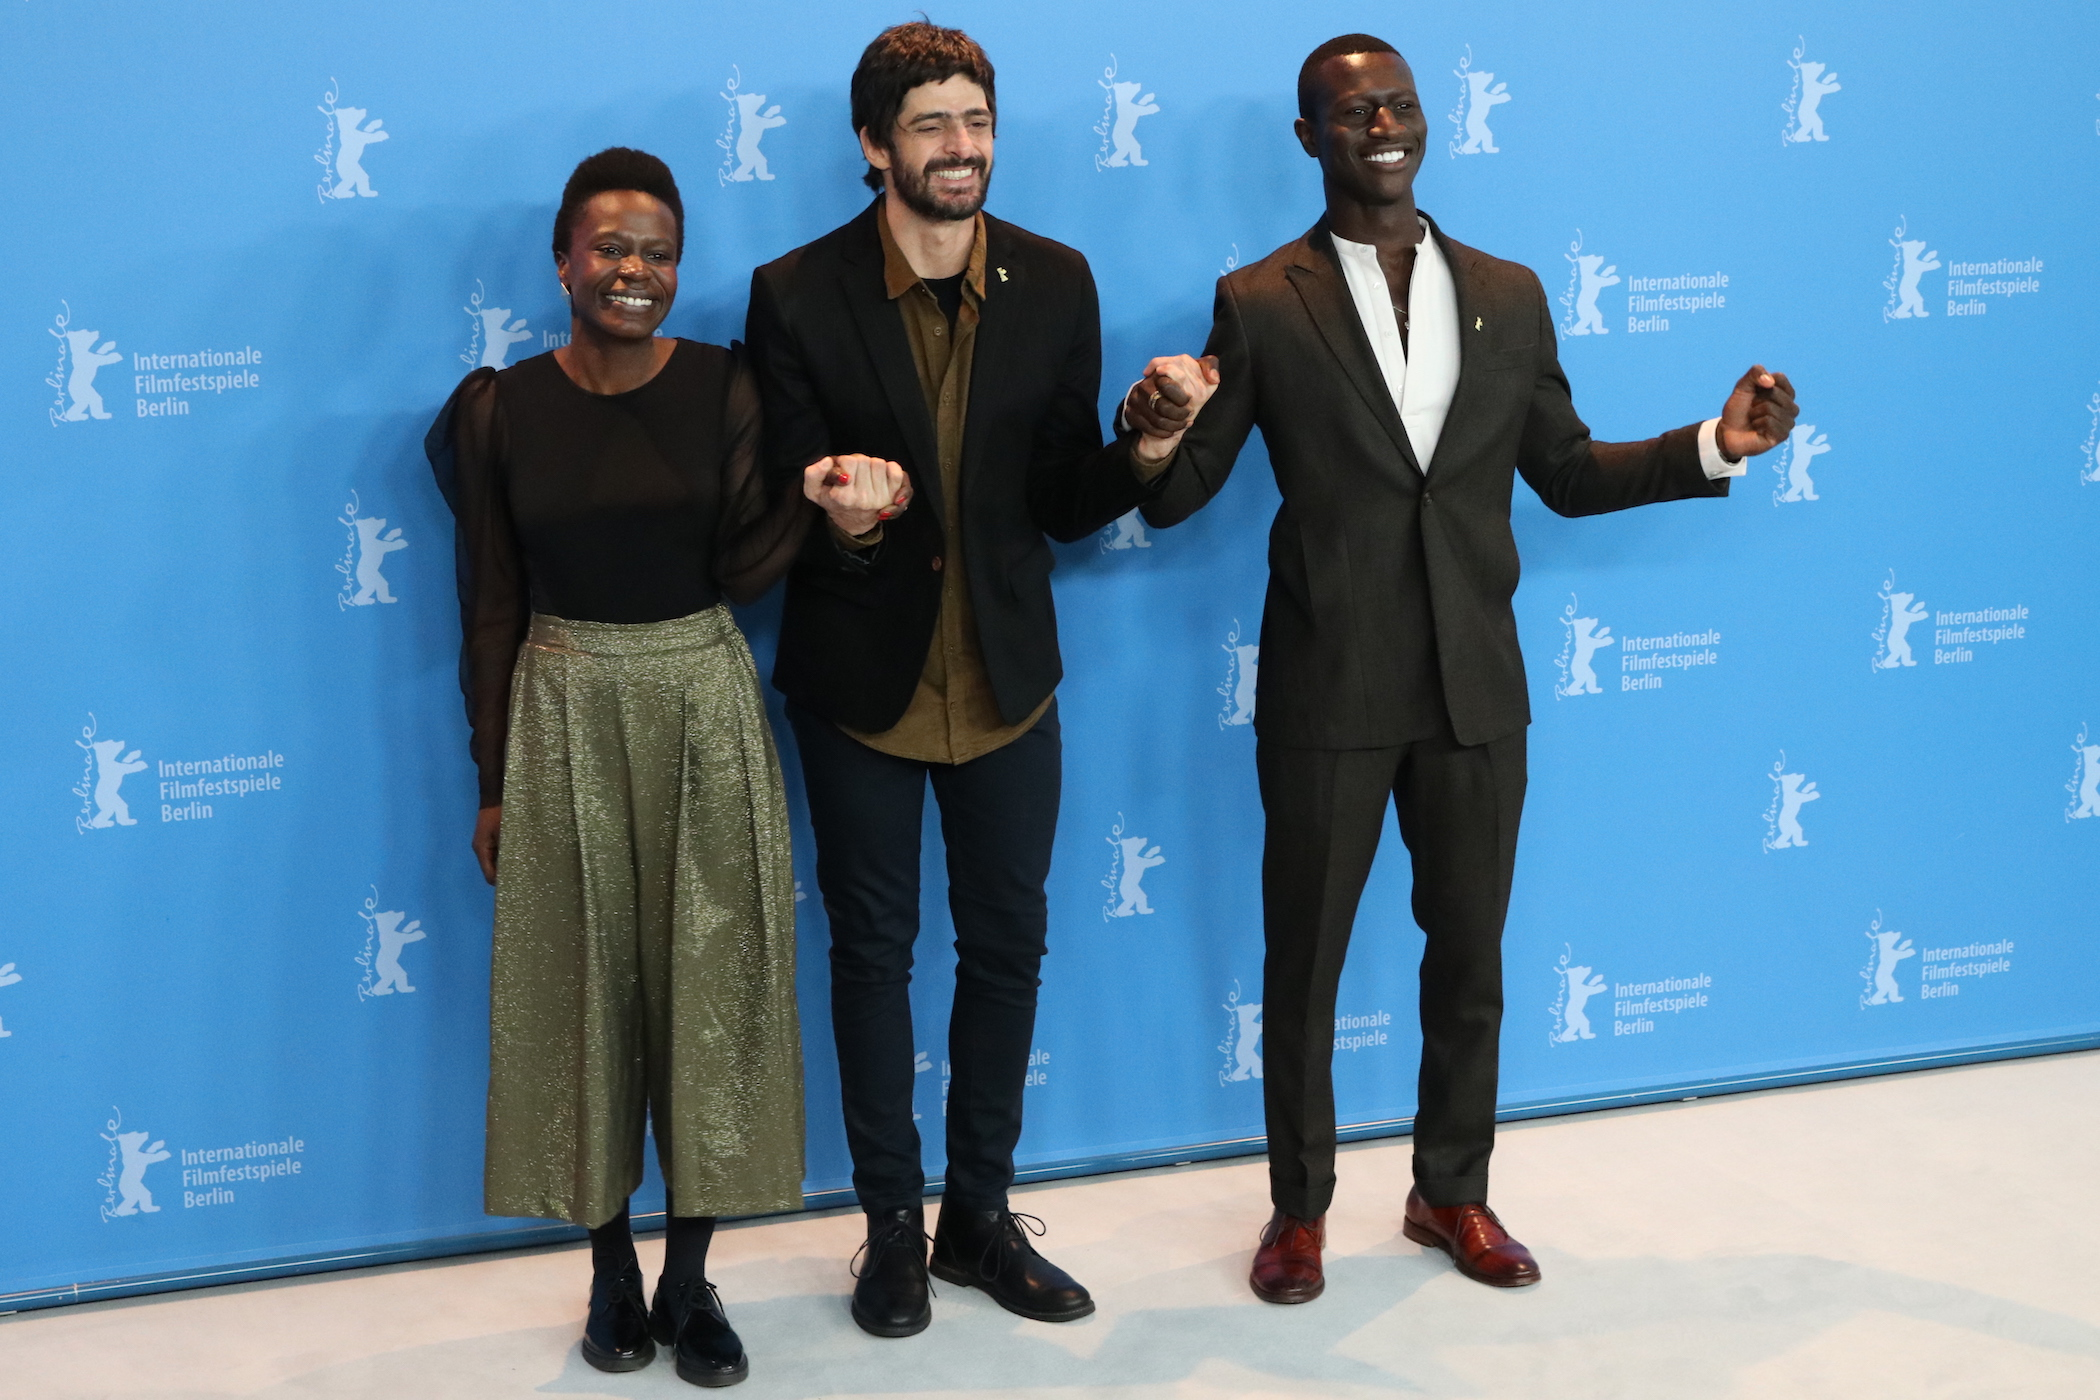 Berlino 2017: Julio Machado, Isabél Zuaa e Welket Bungué al photocall di Joaquim